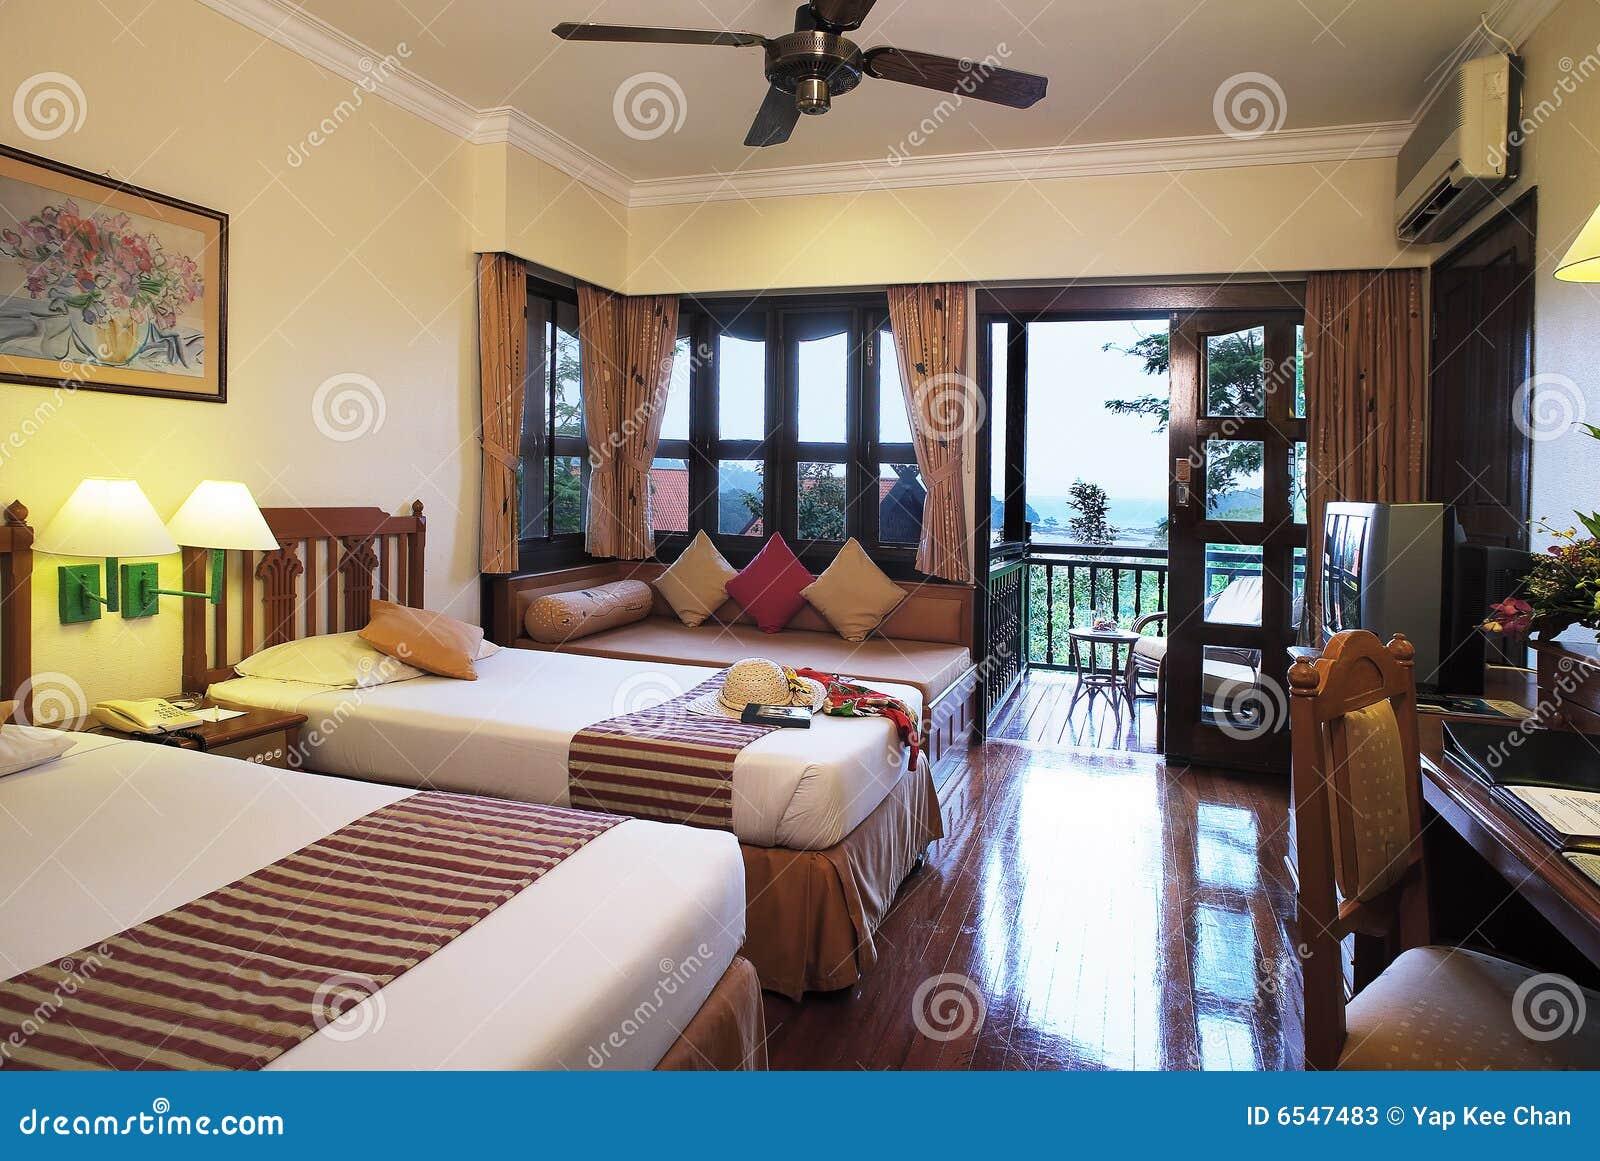 bedroom interior stock photos image 6547483